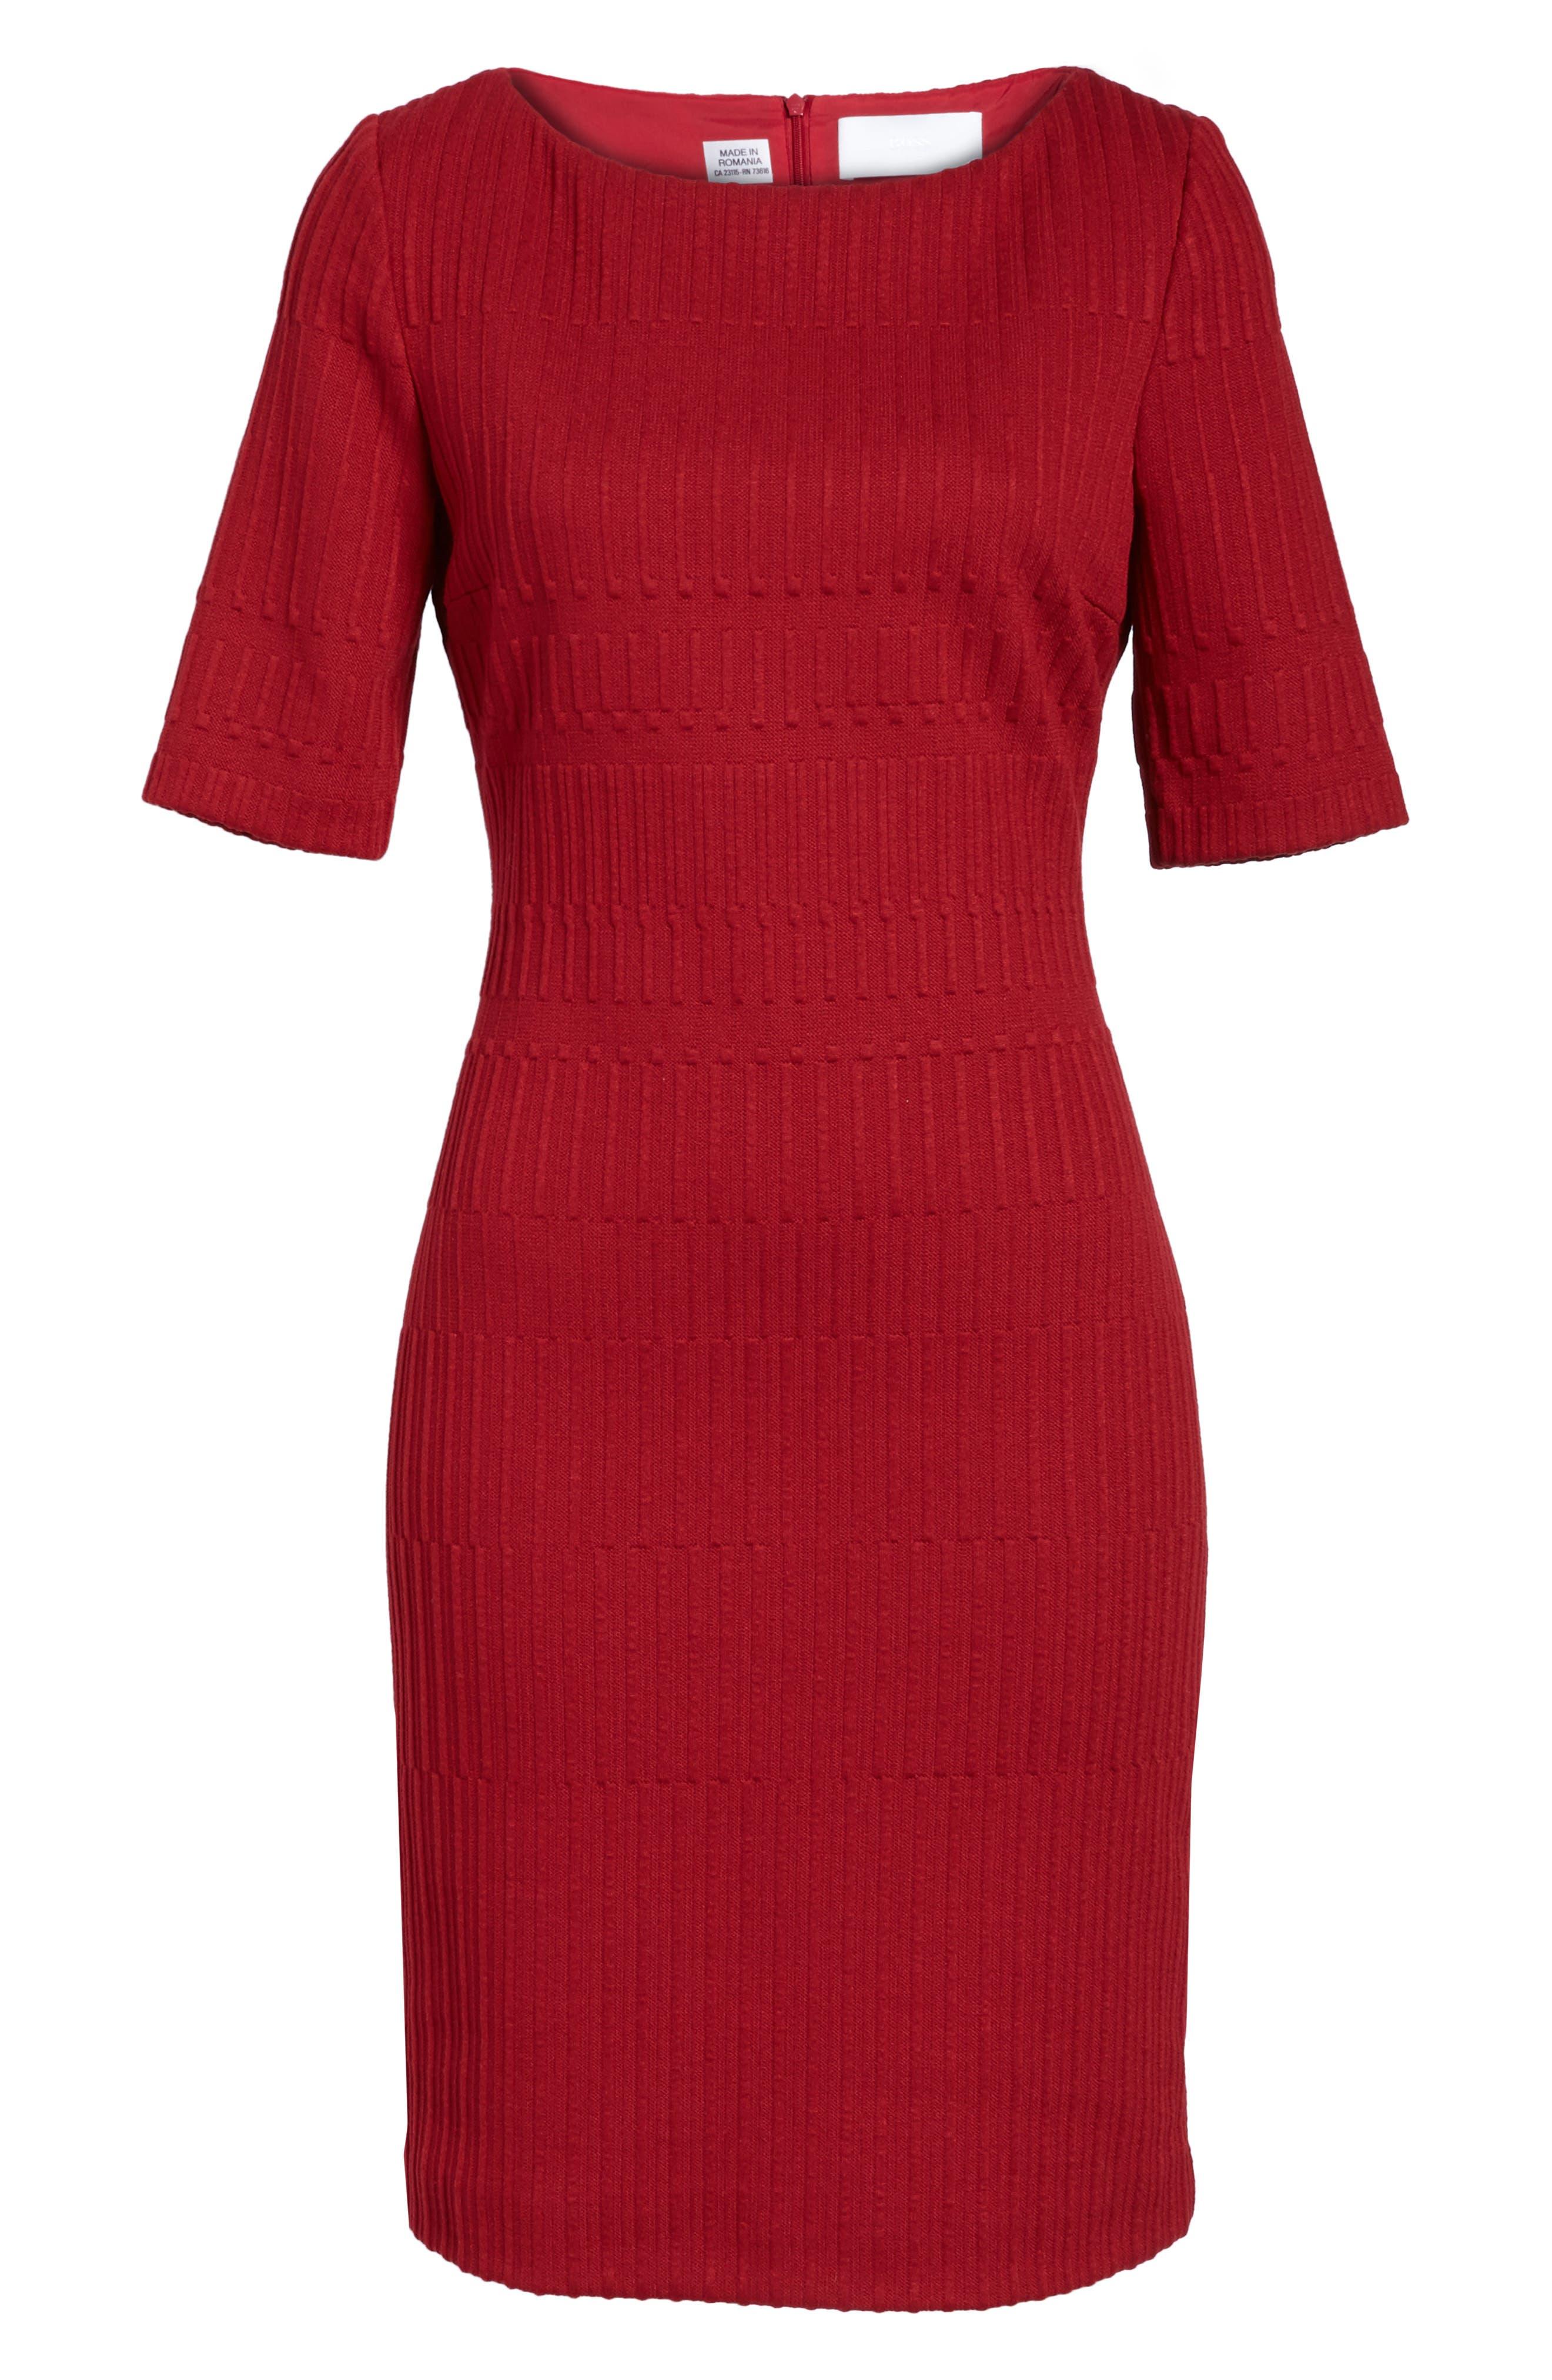 Hadea Knit Sheath Dress,                             Alternate thumbnail 6, color,                             Pomegranate